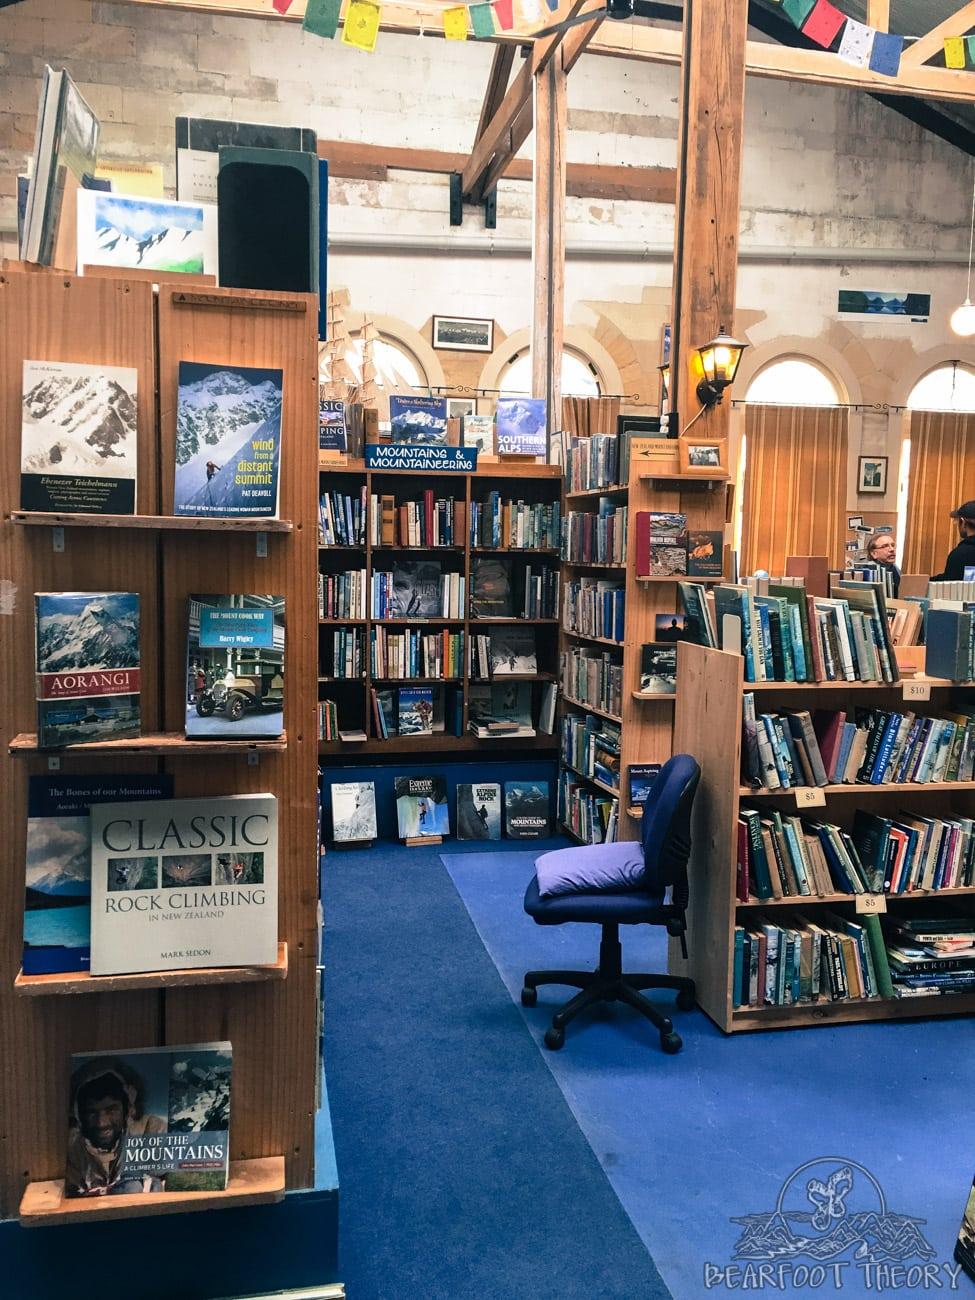 The Adventure Book store in Oamaru, New Zealand